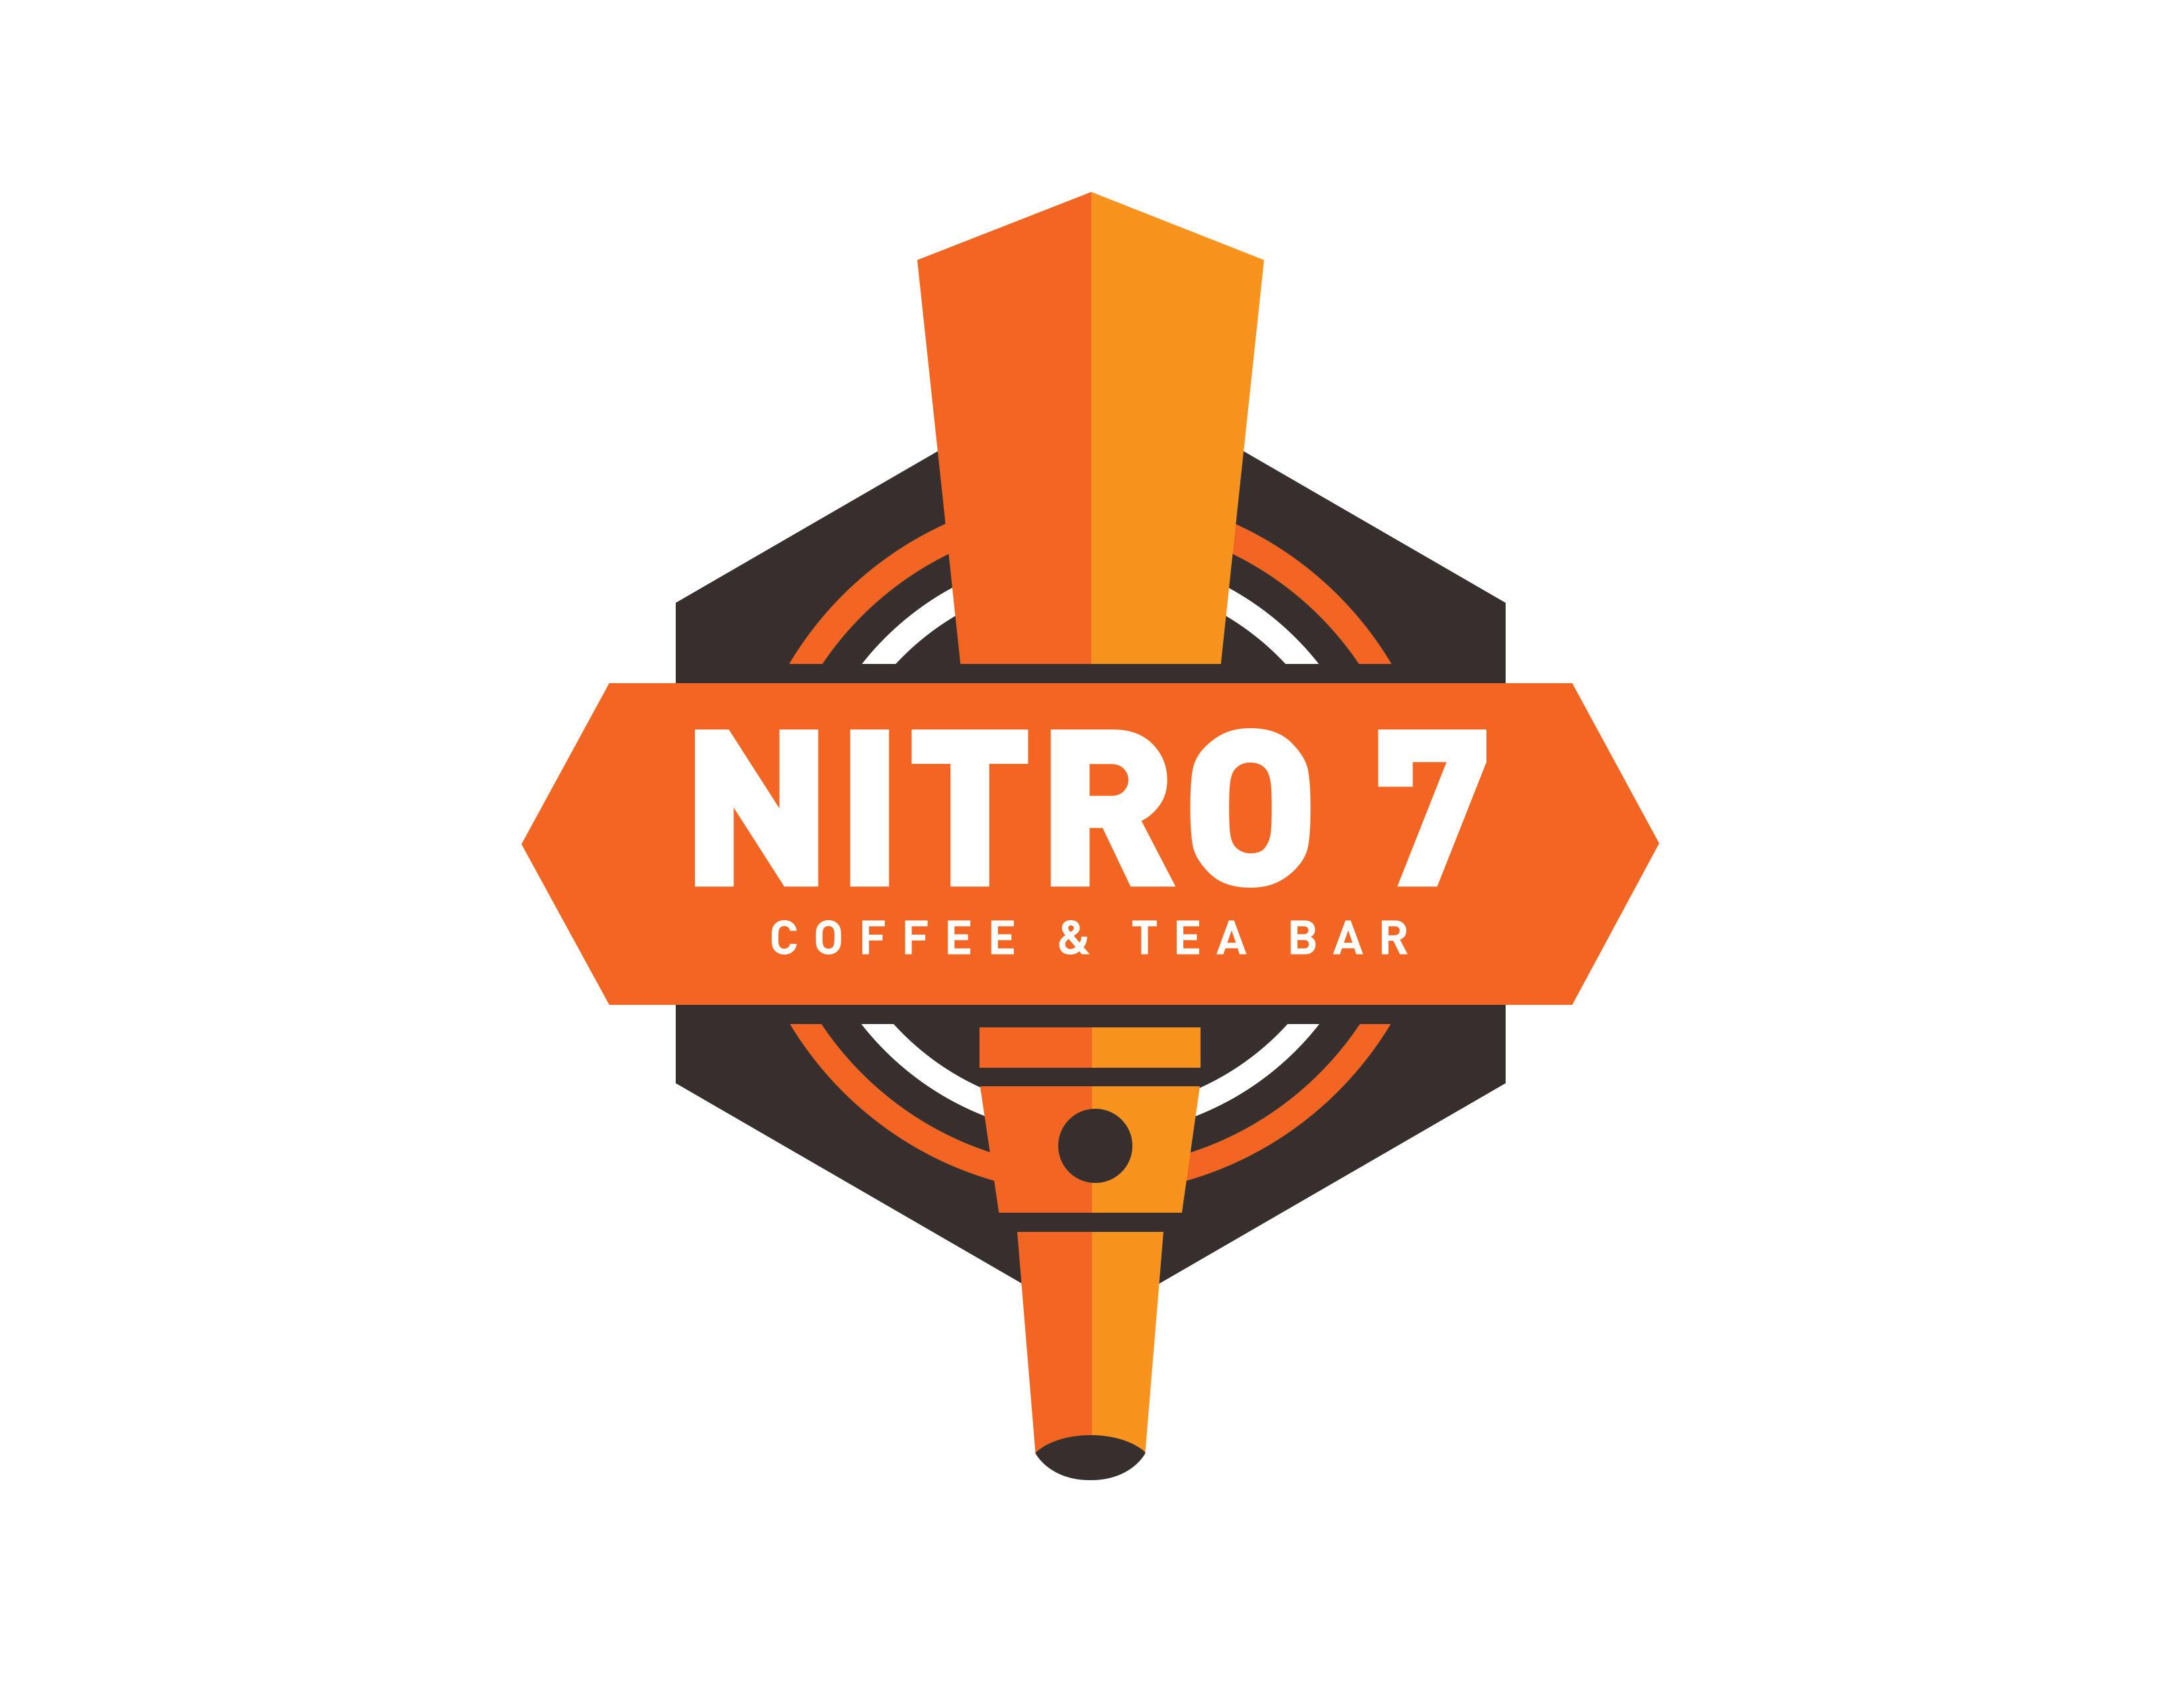 Nitro7 Coffee and Tea Bar brand logo